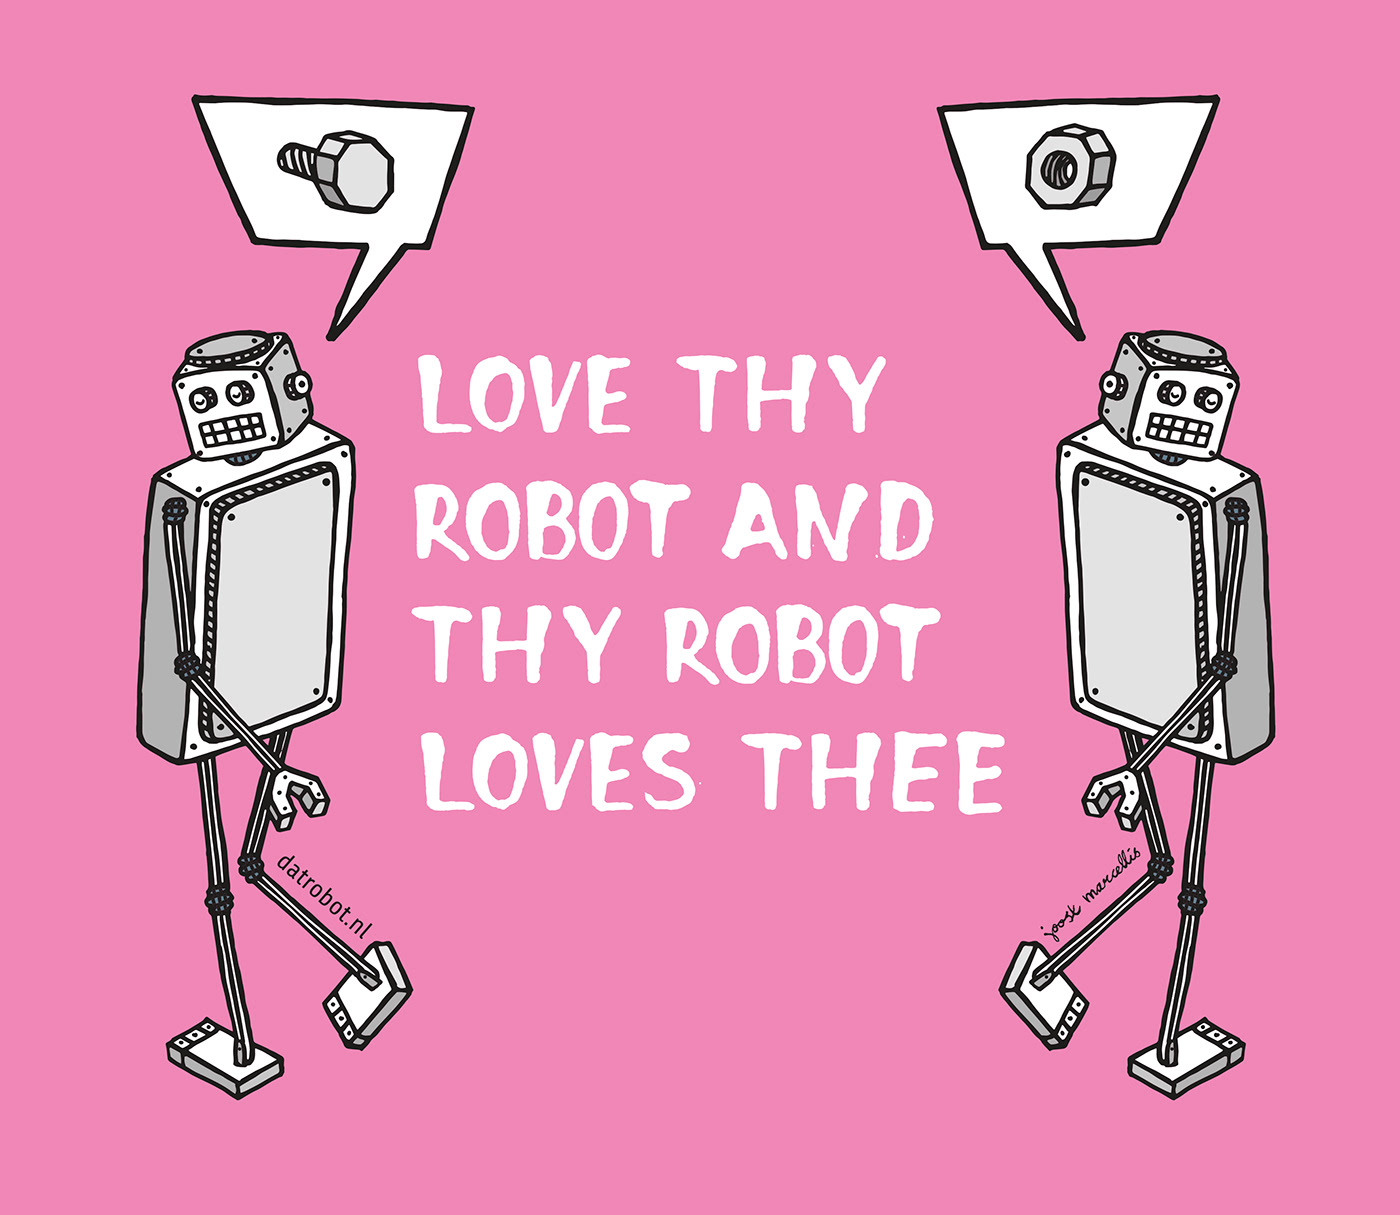 robot DatRobot robots love thy robot nerdcore robotics geek nerd Science new religion Love